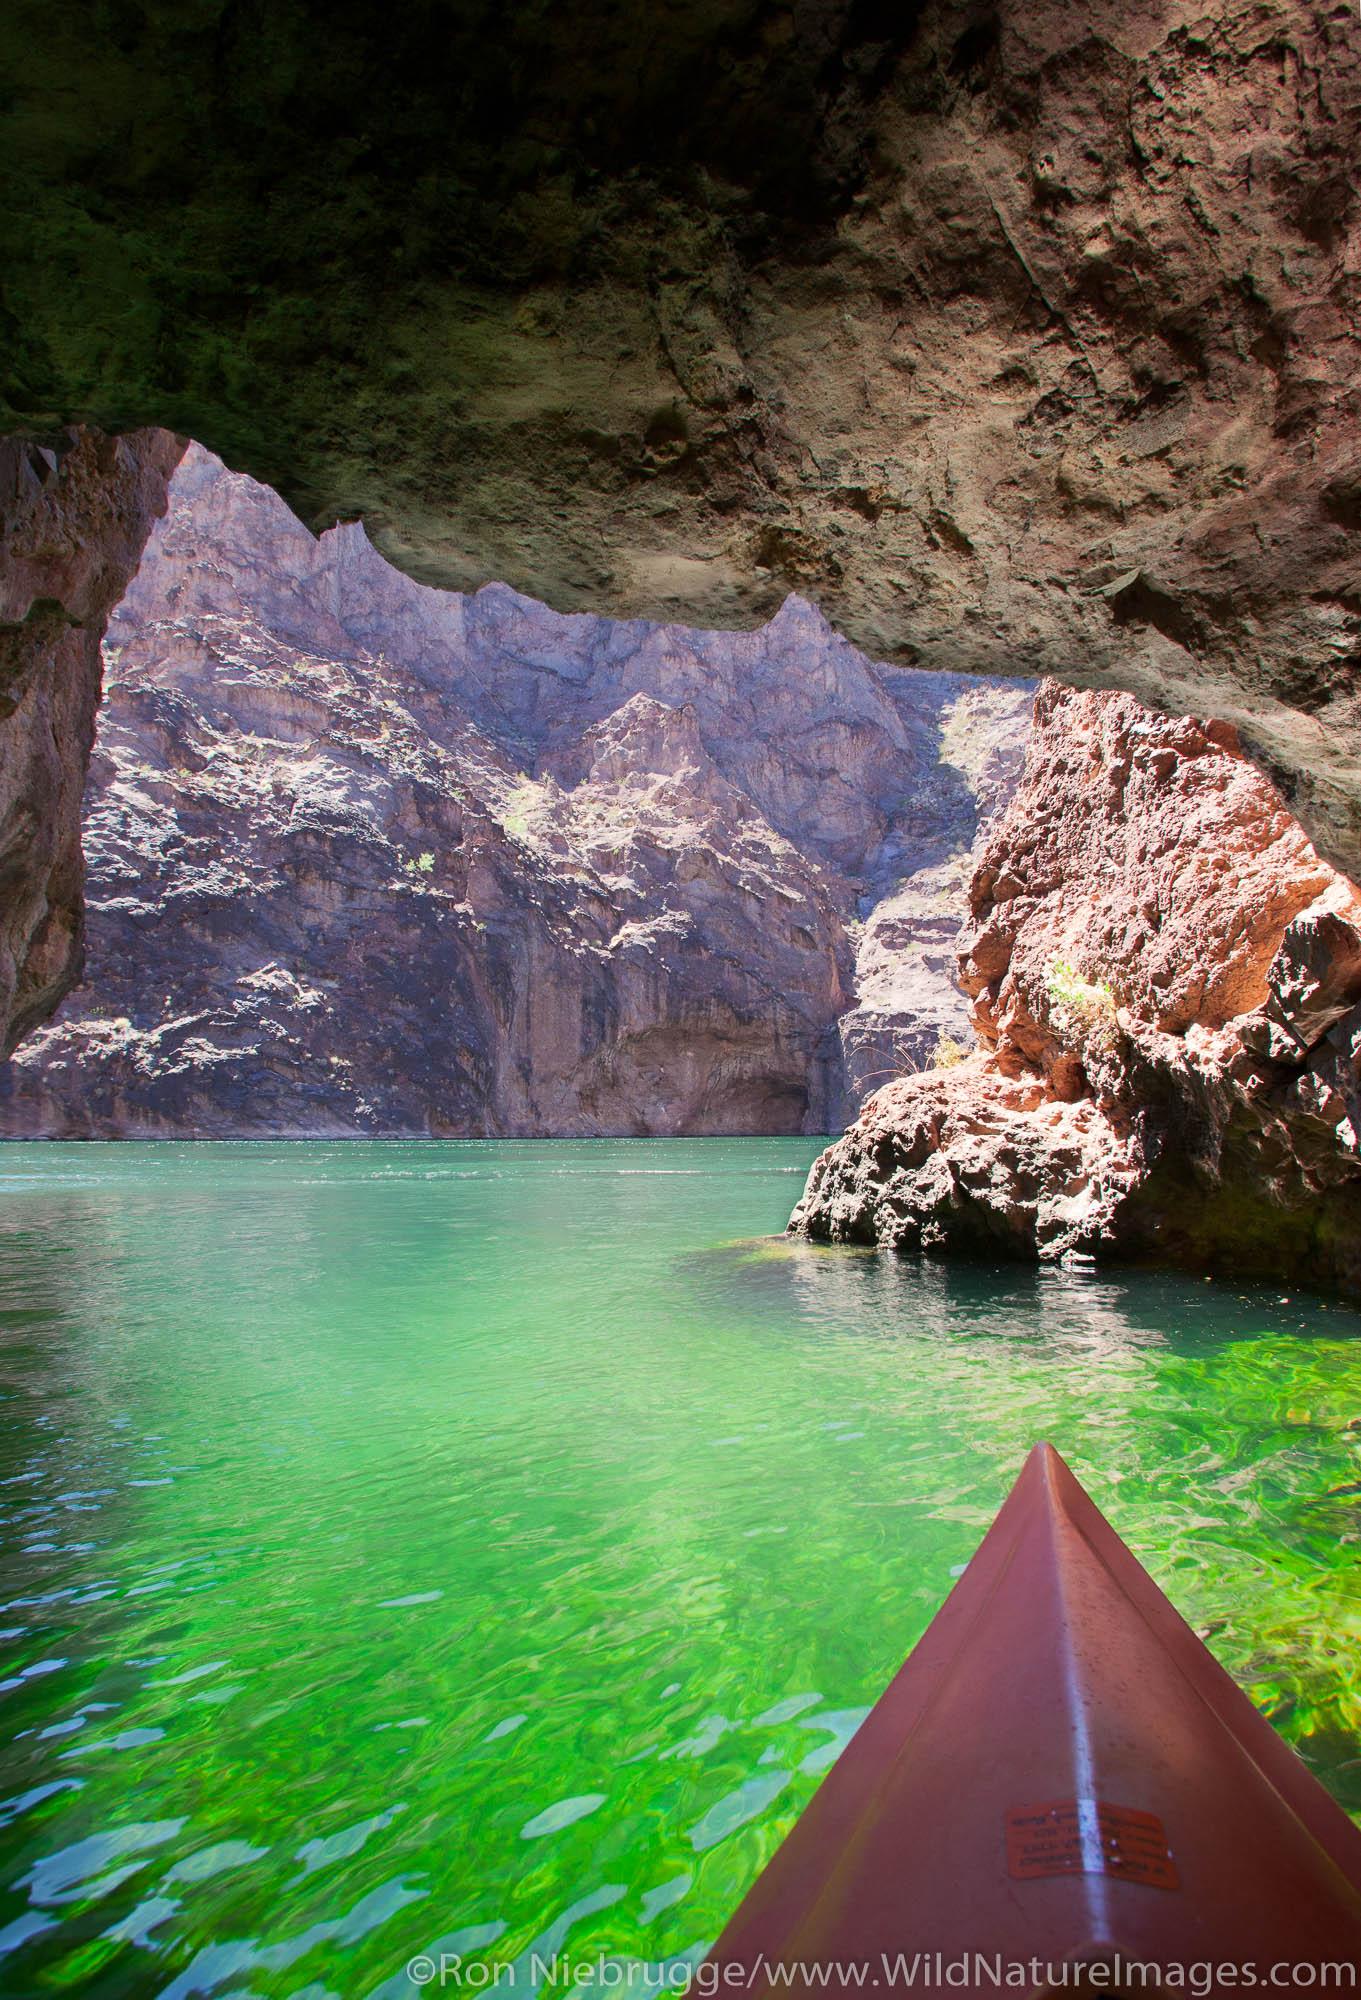 Kayaking on the Colorado River, Lake Mead National Recreation Area, near Las Vegas, Nevada.